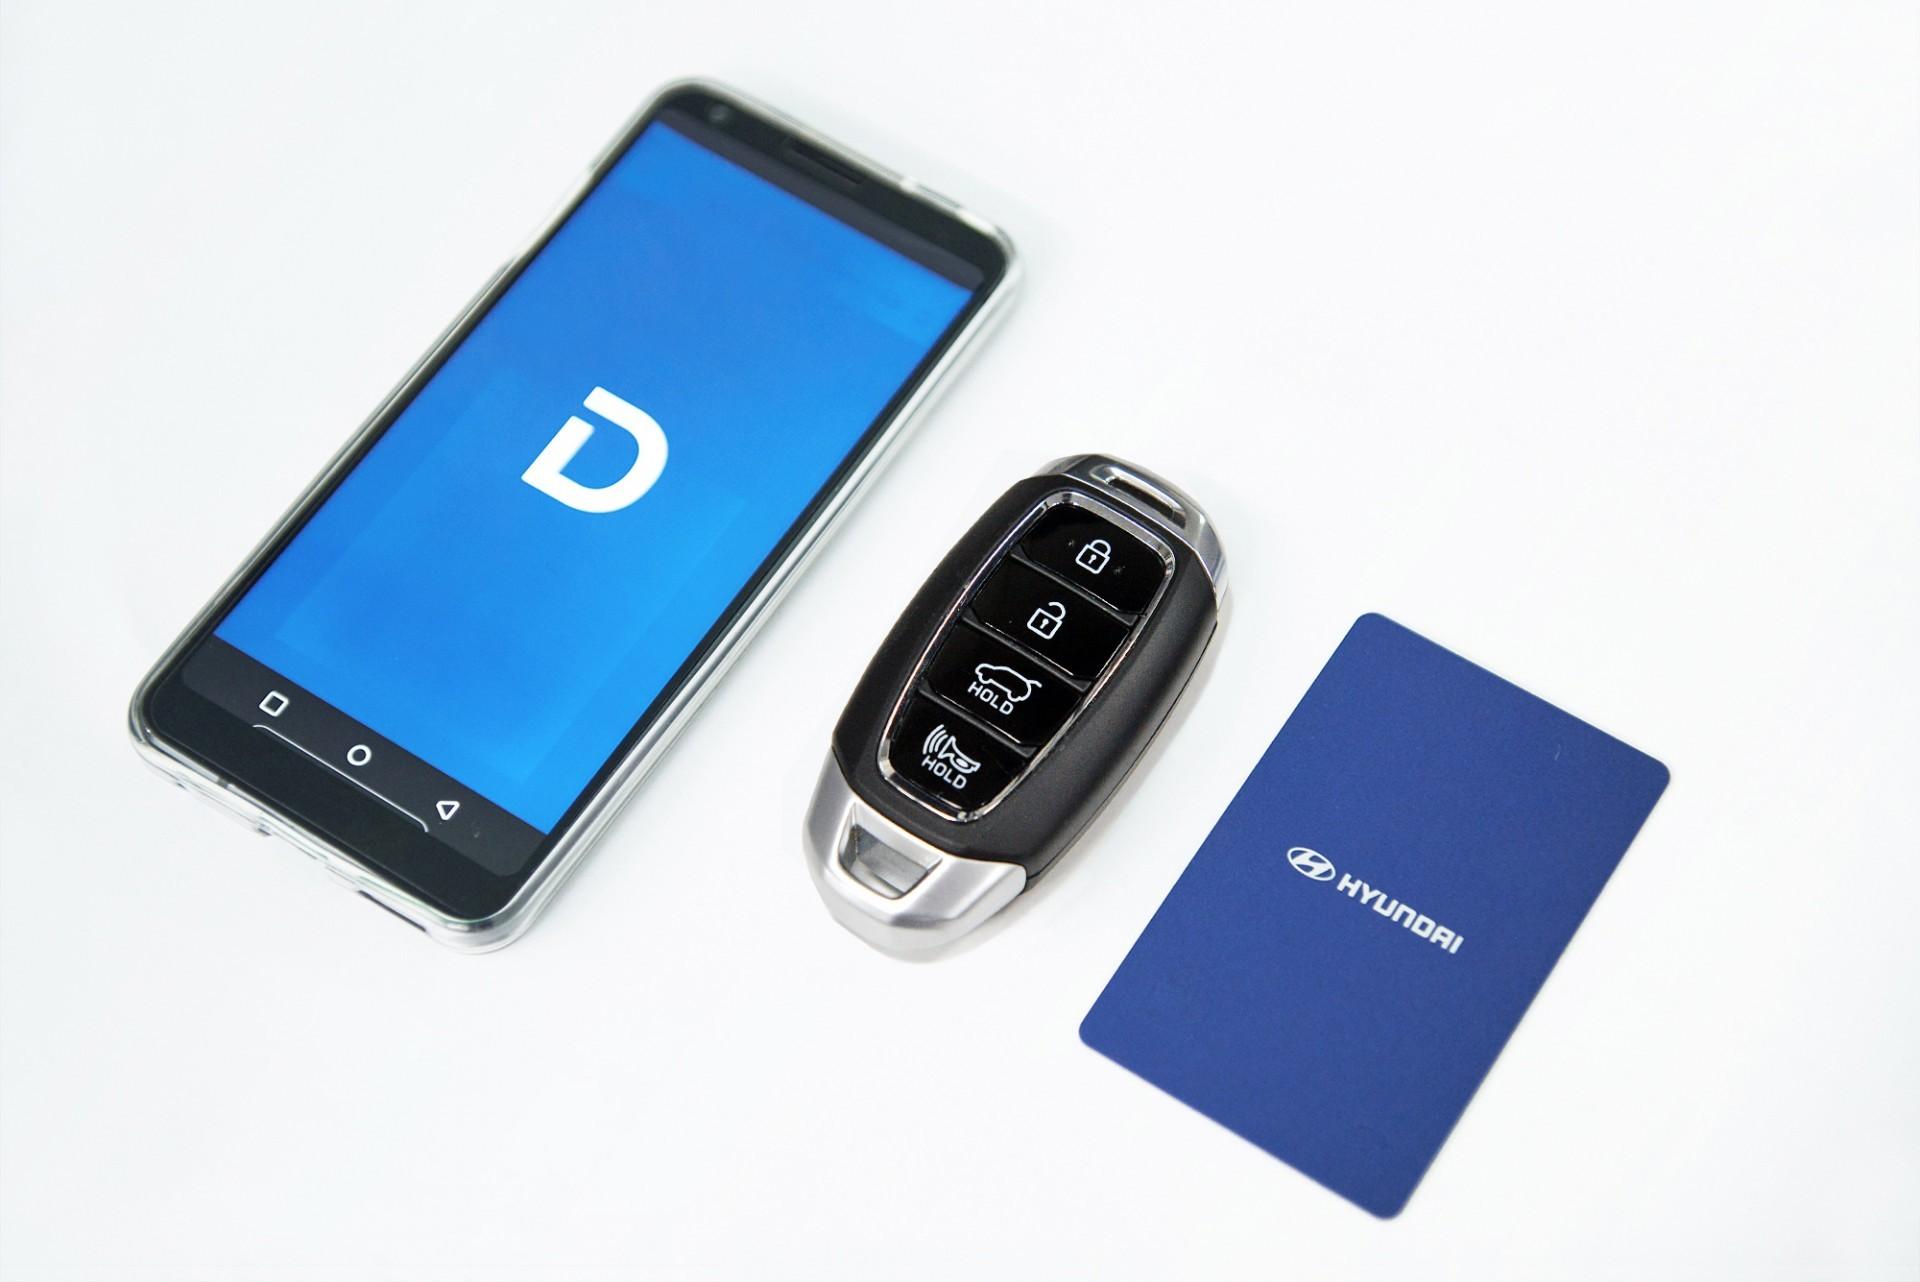 190304_Hyundai Motor group Develops Smartphone-based Digital Key_Press Photo2